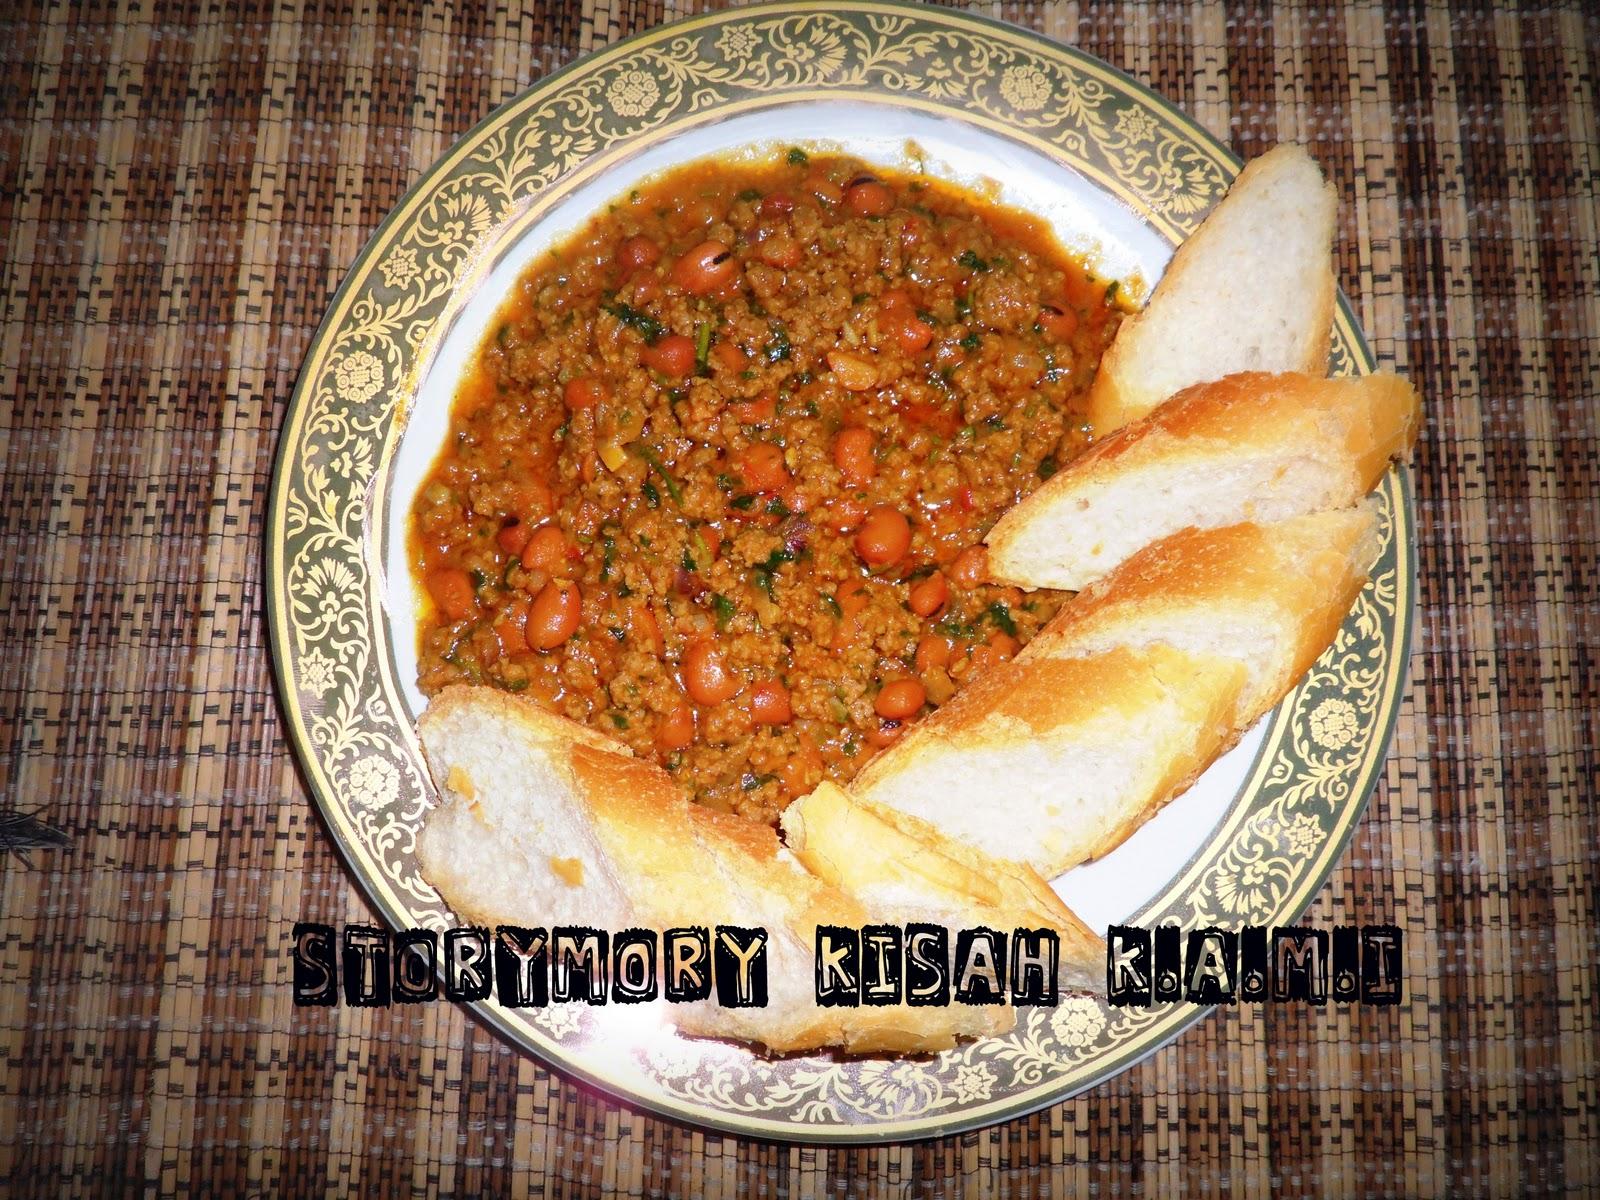 STORYMORY KISAH K.A.M.I: AKU masak AKU makan